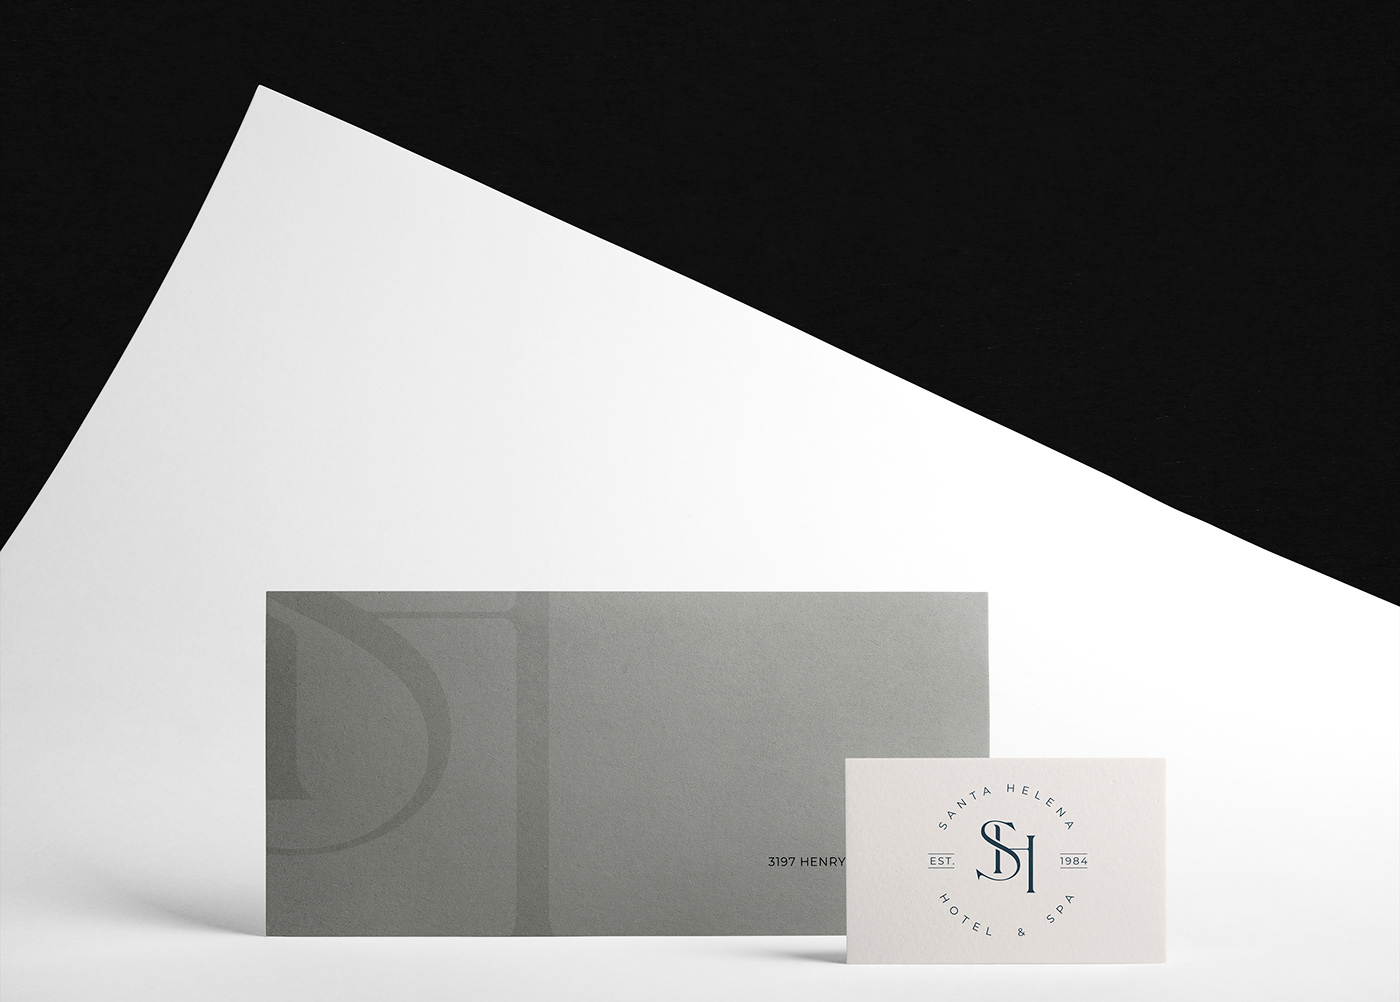 Image may contain: abstract, handwriting and minimalist